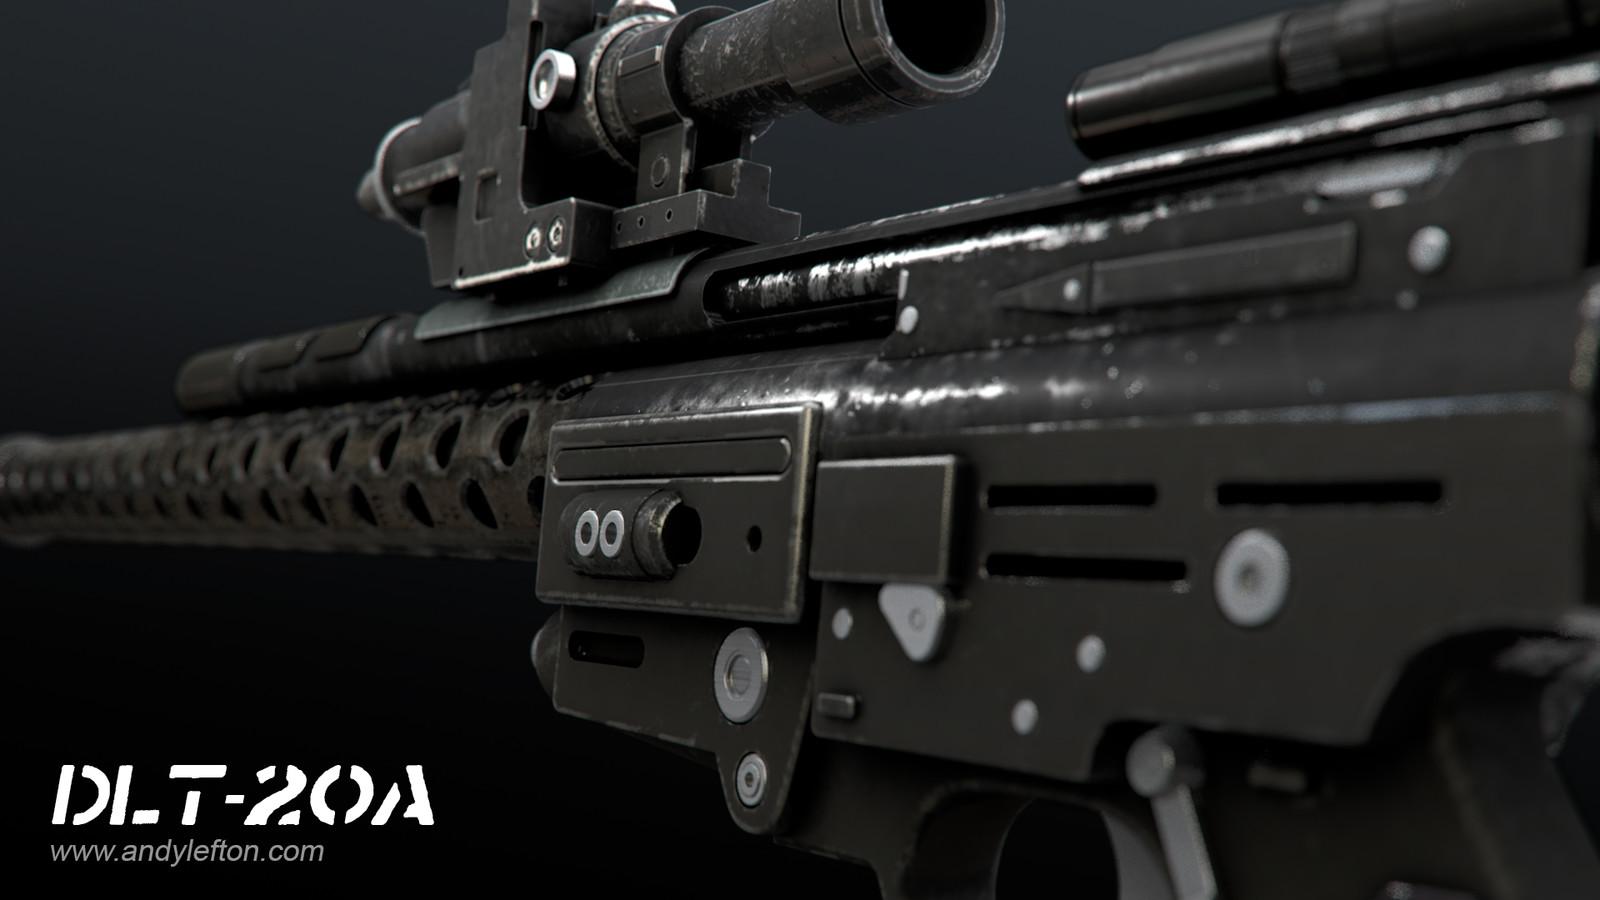 DLT-20A Blaster Rifle